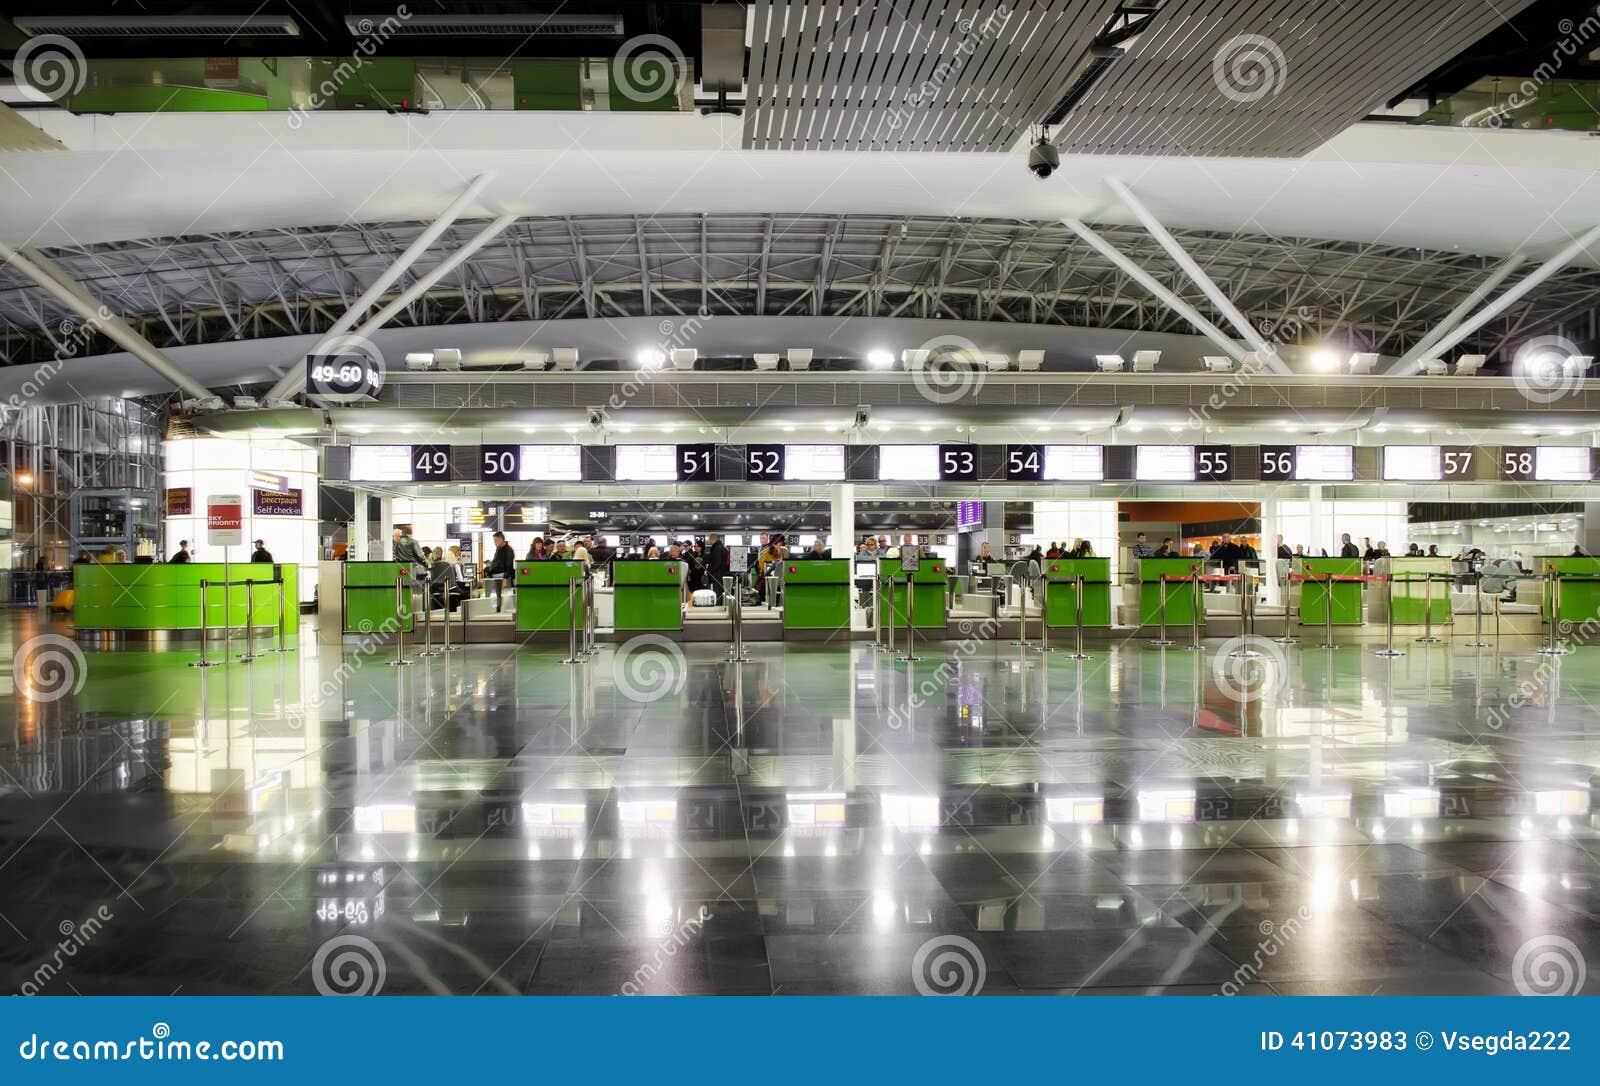 Aeroporto Kiev : Kiev borispol airport editorial stock photo image of tourism